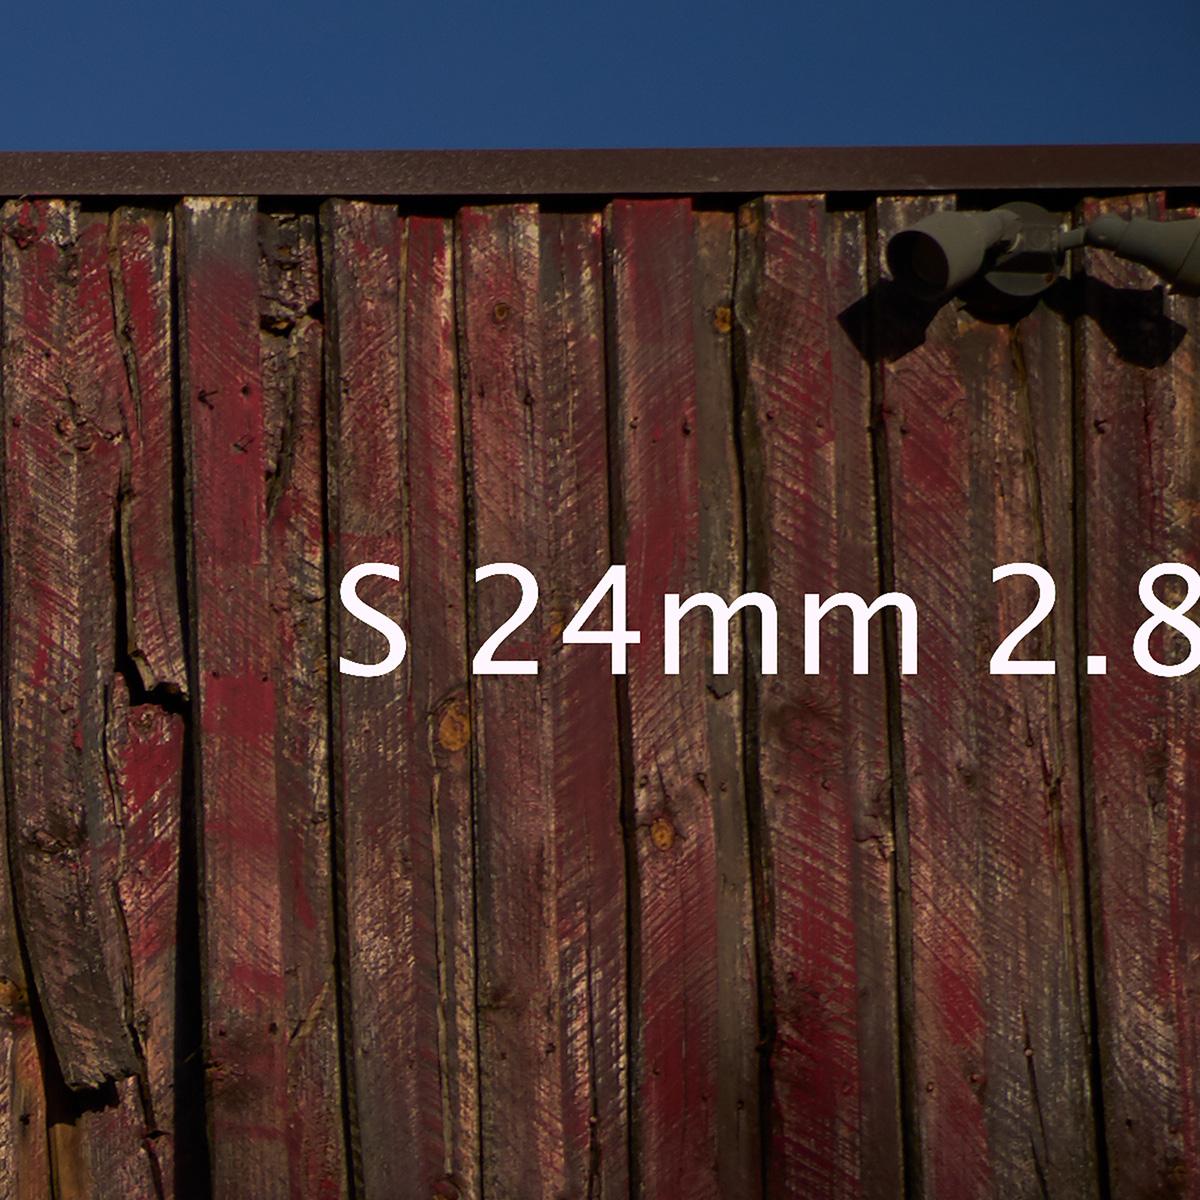 24mm f28 right by Guy Mancuso in Guy Mancuso